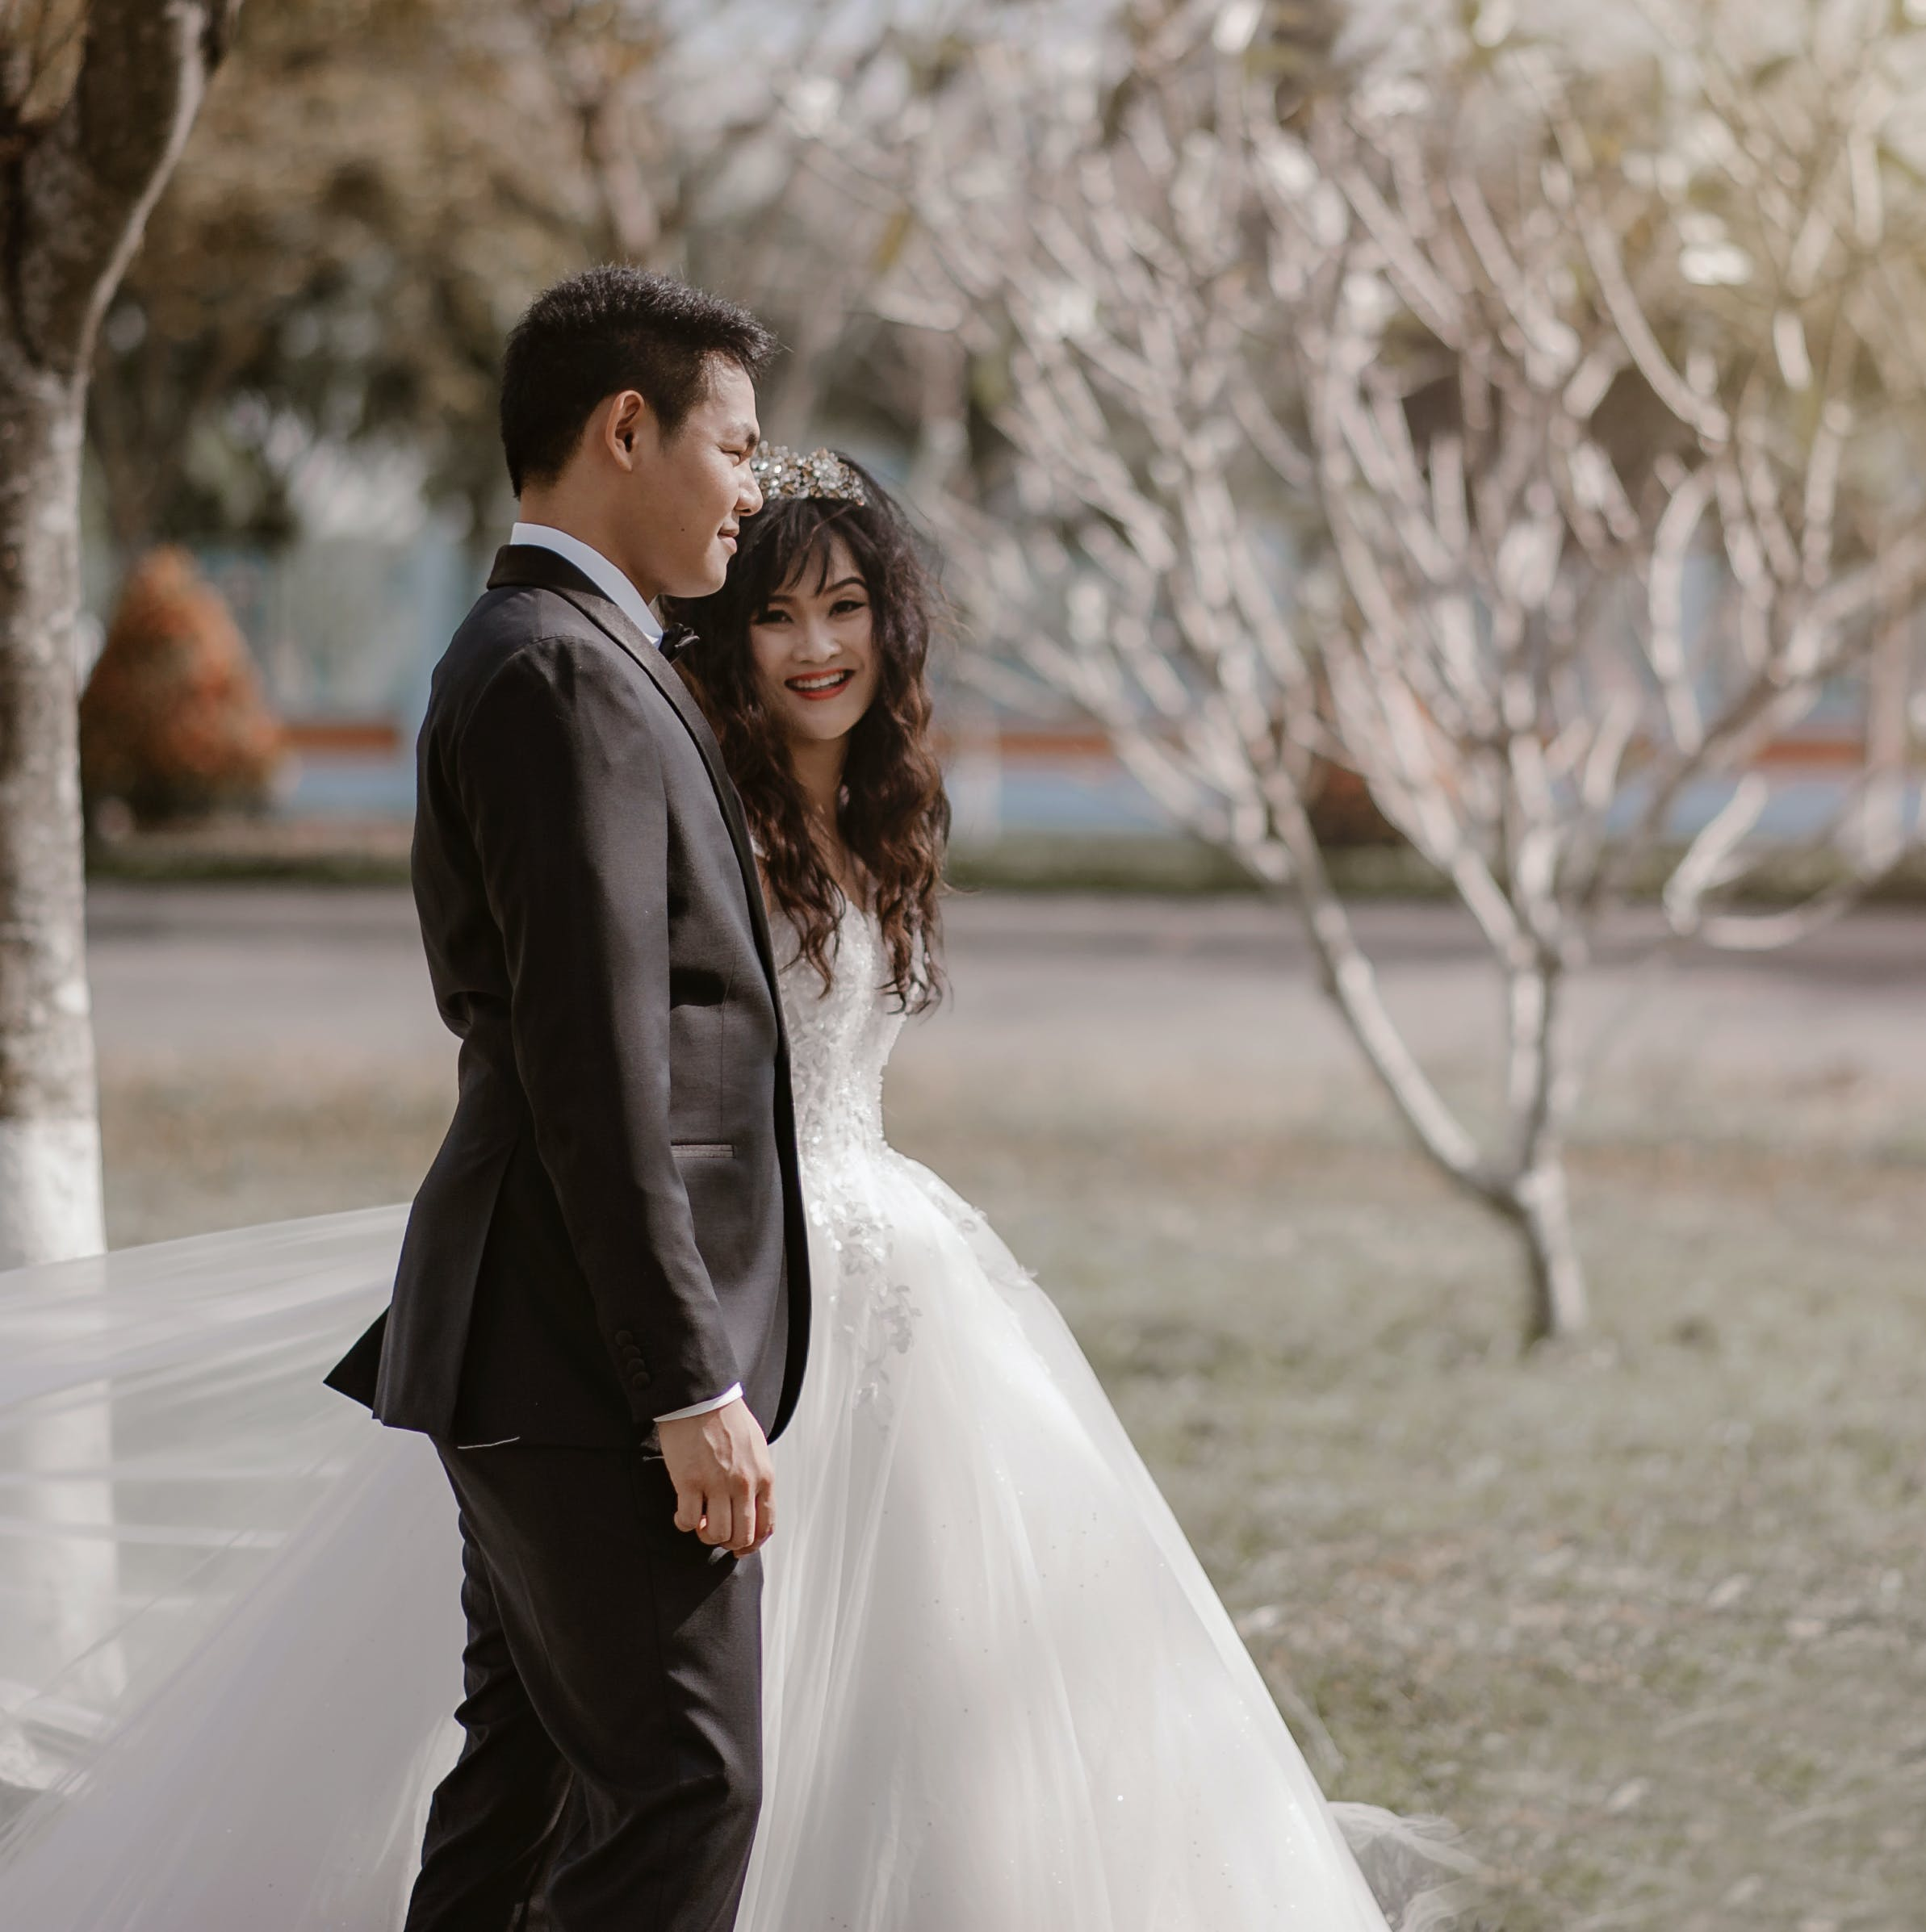 Kostenloses Stock Foto zu anzug, braut, braut und bräutigam, bräutigam